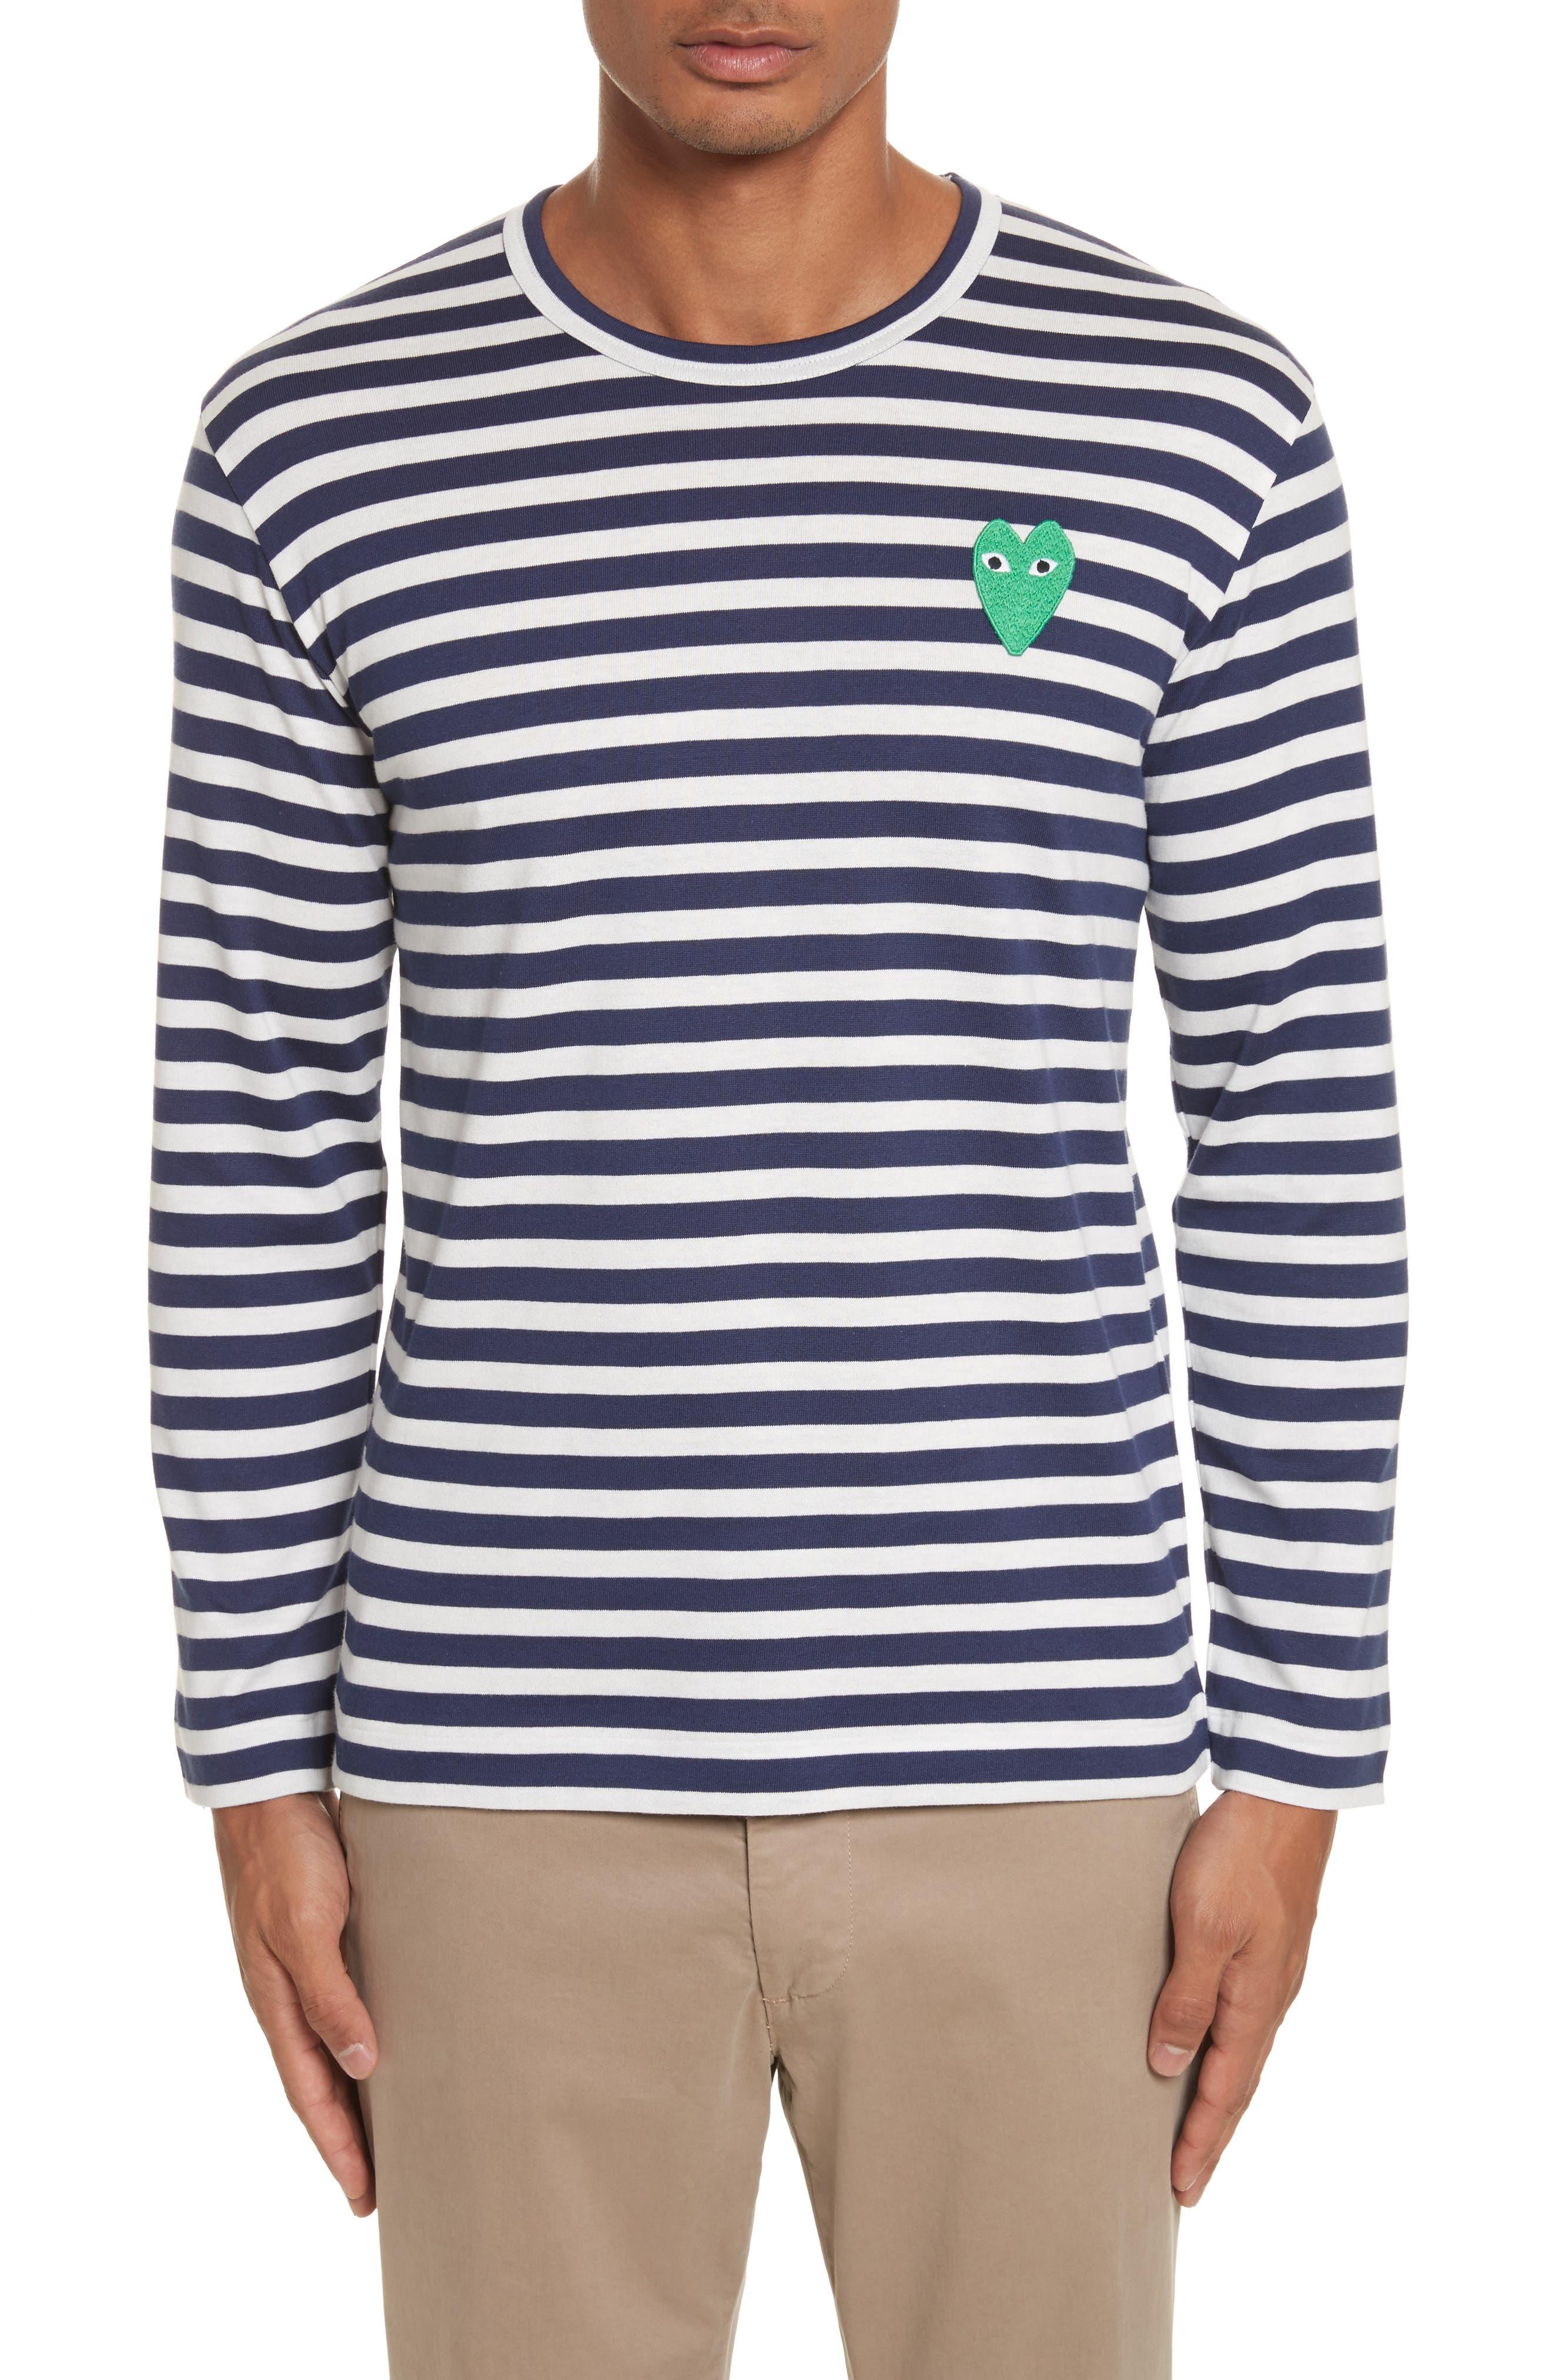 Comme des Garçons PLAY Stripe Long Sleeve T-Shirt,                         Main,                         color, Navy/ White